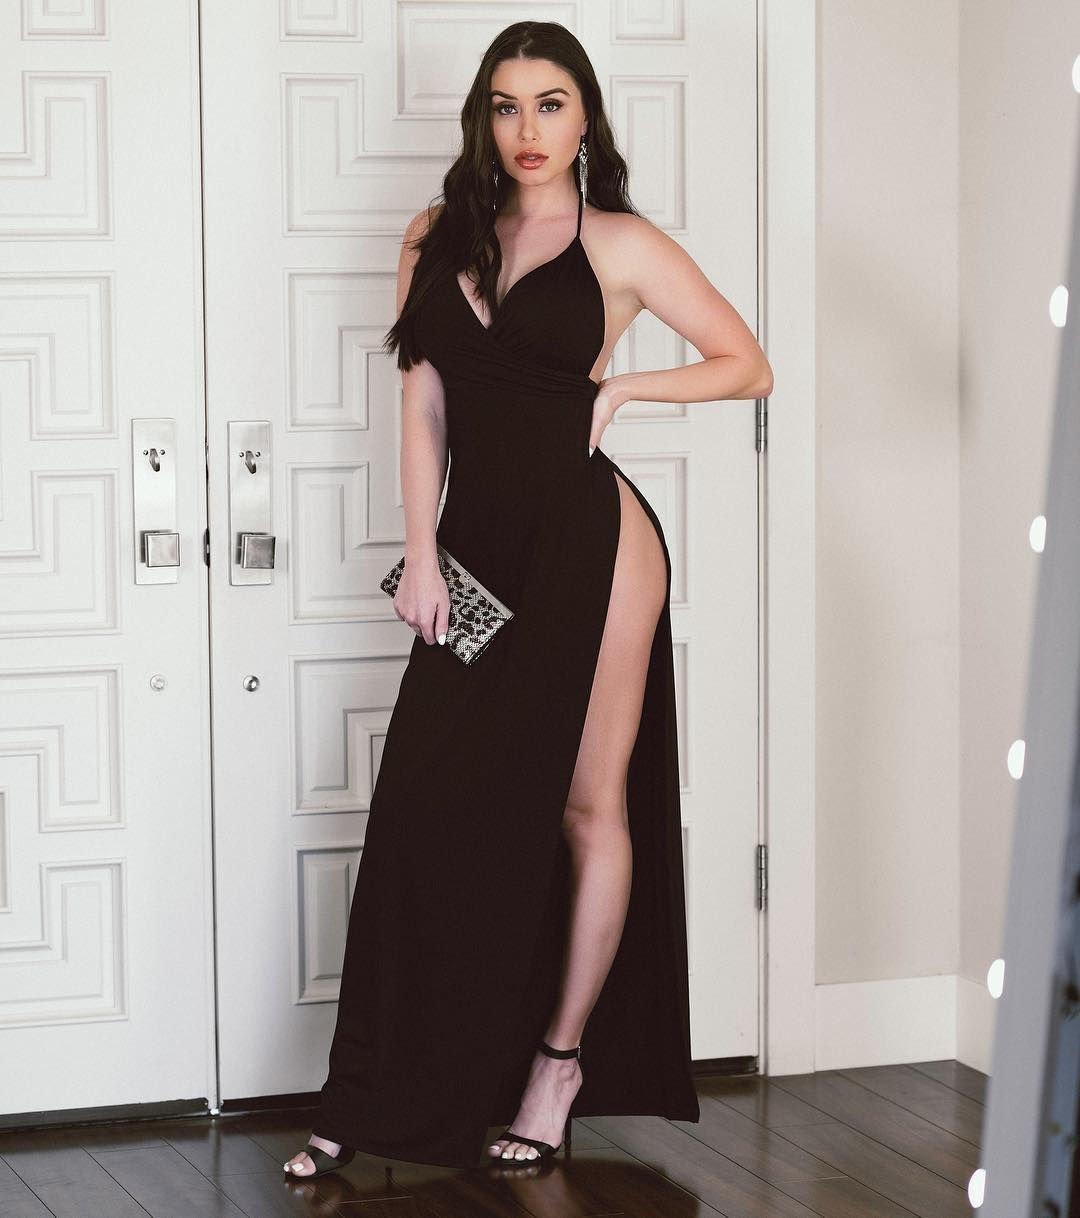 Sexy Laura Marie  nudes (96 fotos), Instagram, braless